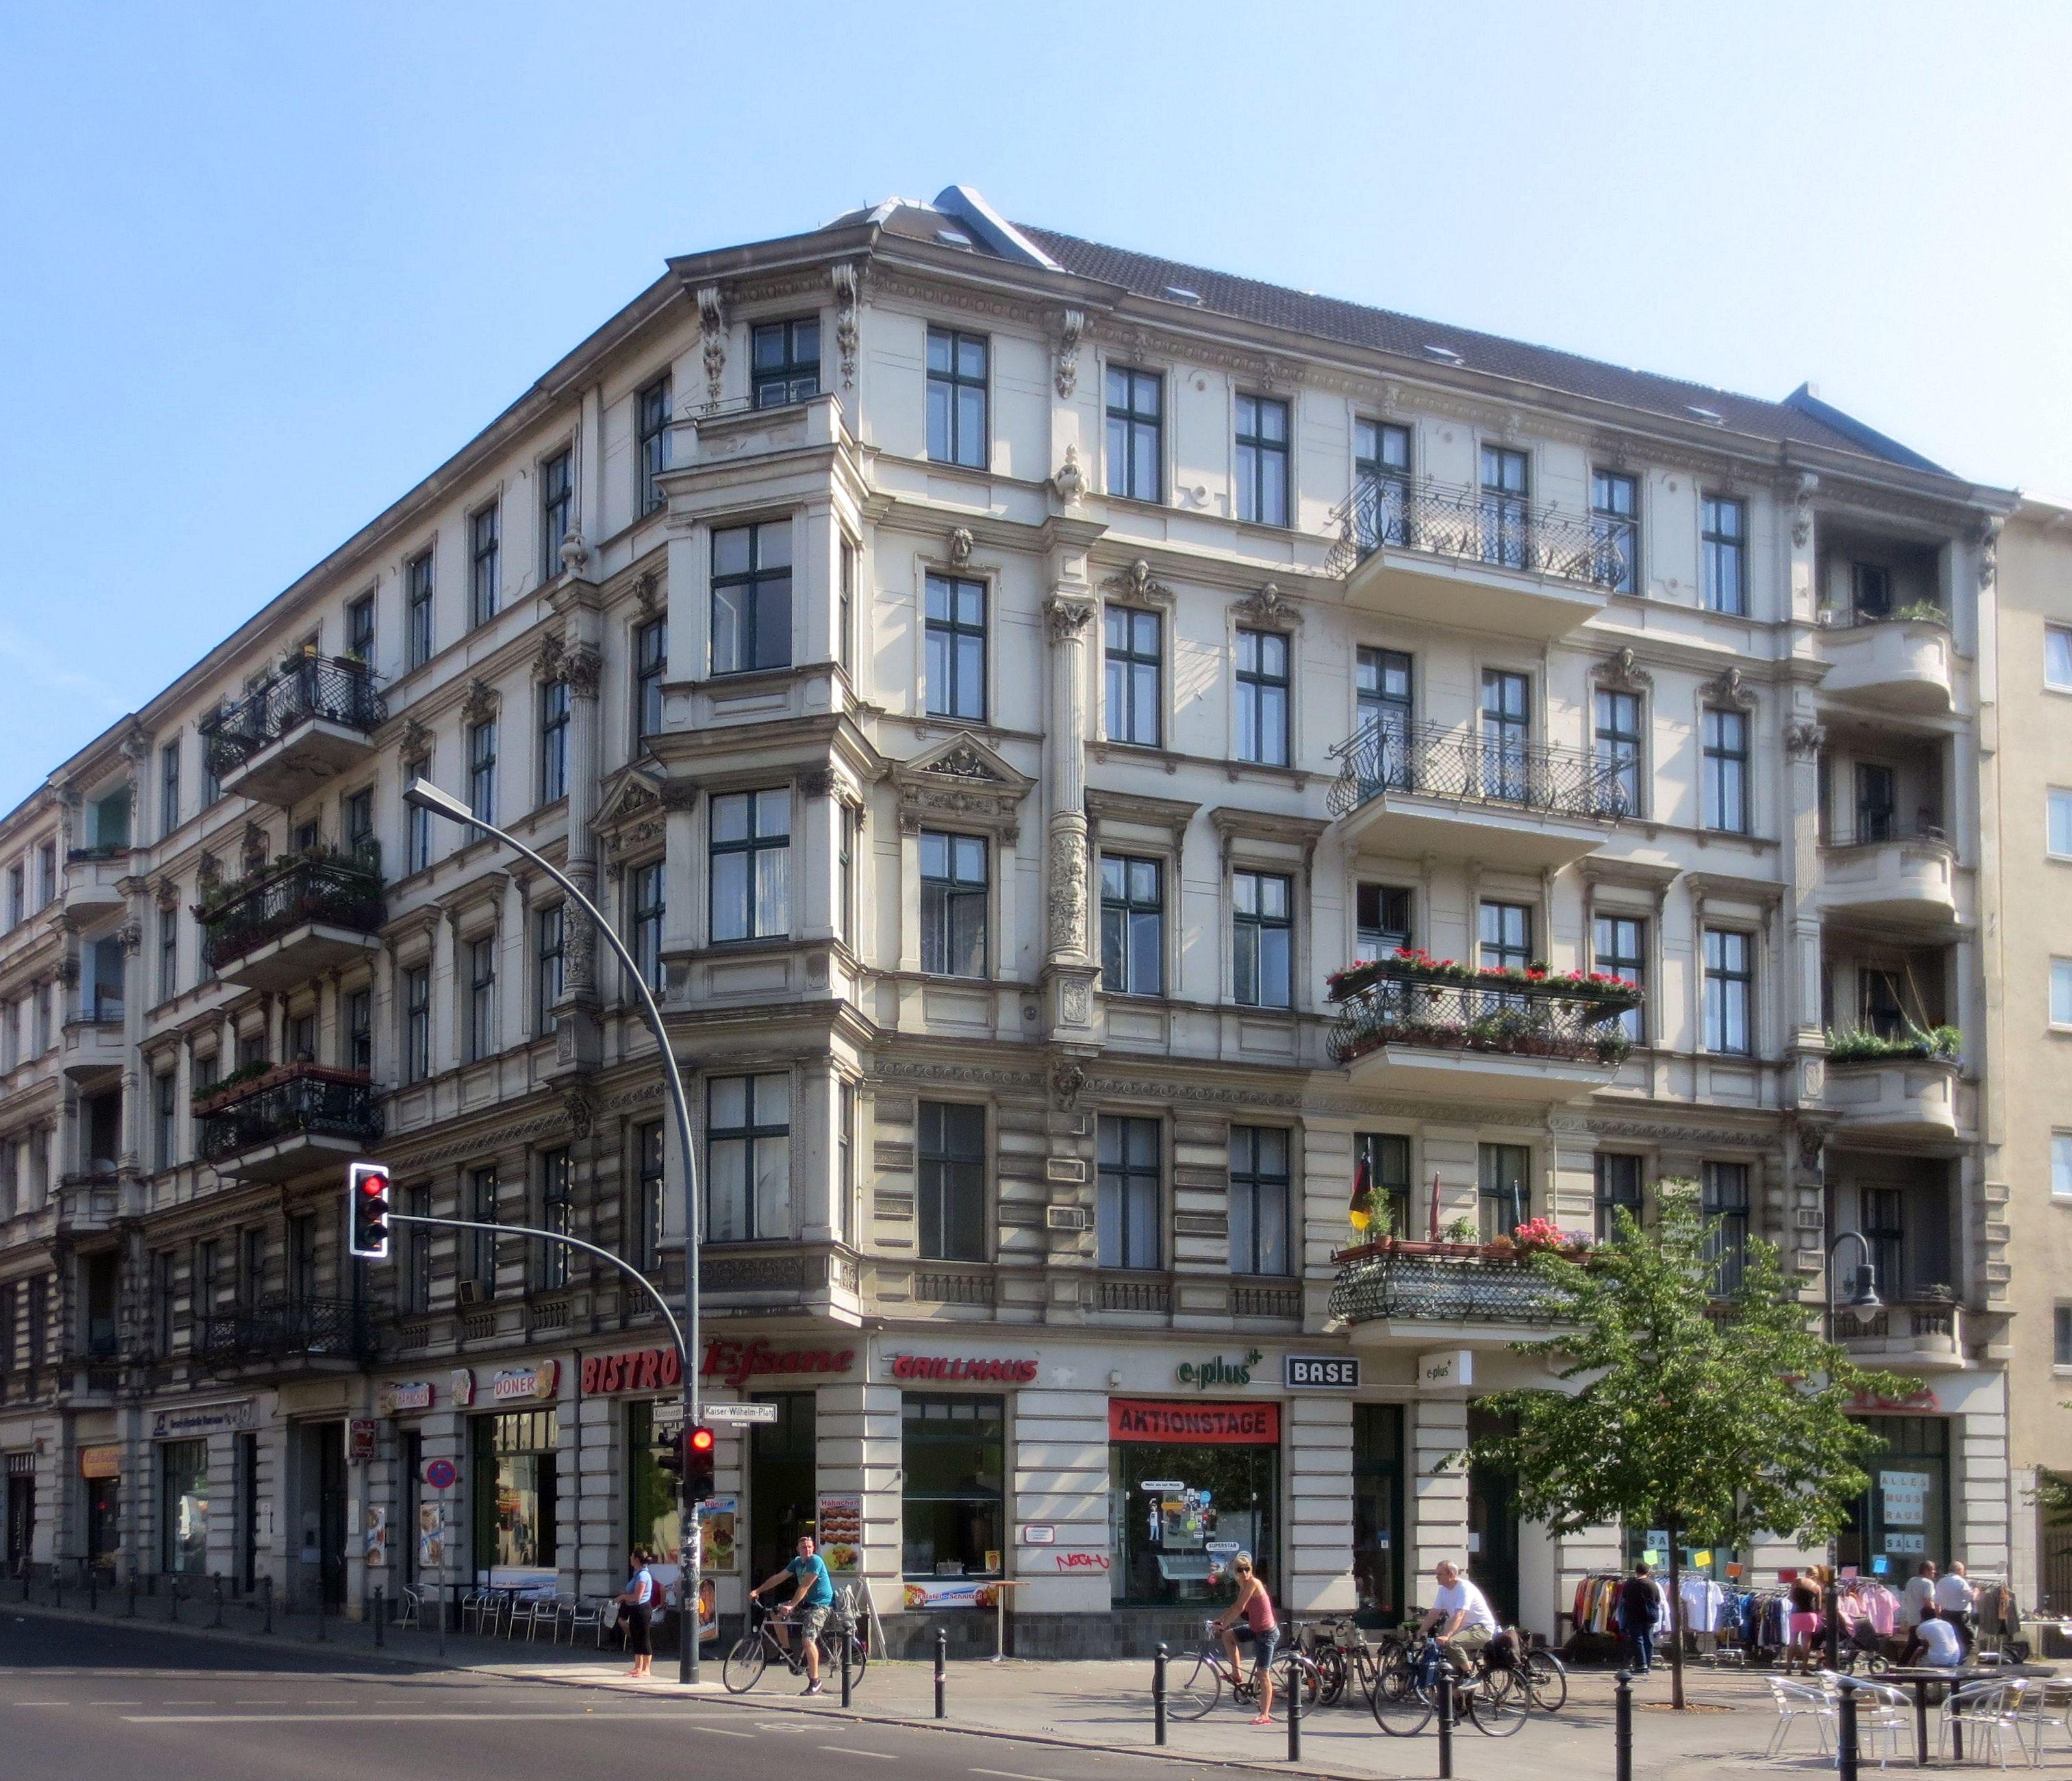 file berlin schoeneberg kaiser wilhelm platz 4 wikimedia commons. Black Bedroom Furniture Sets. Home Design Ideas